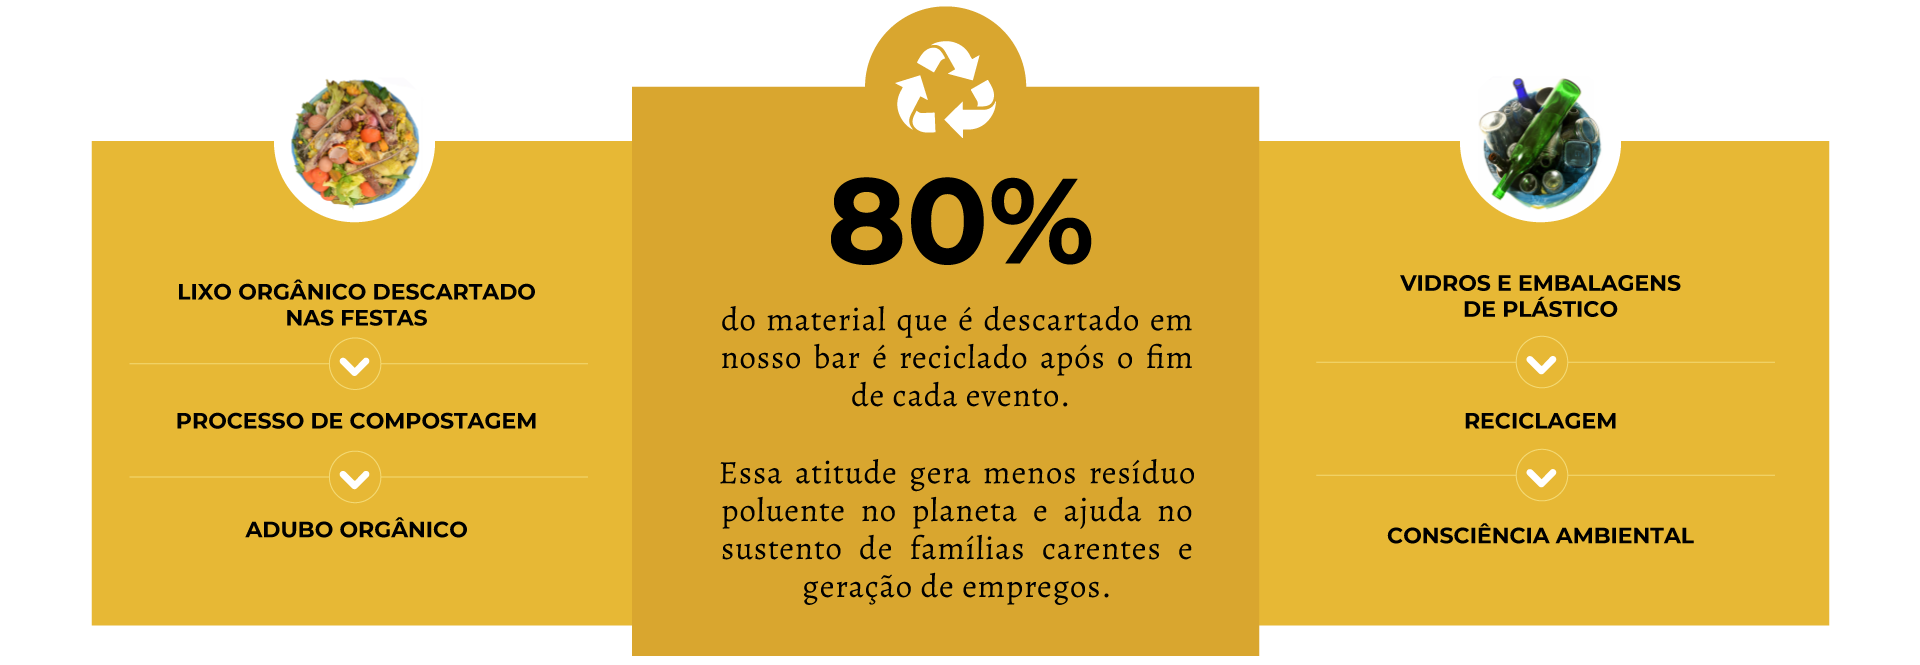 Joe Drinks - Sustentabilidade